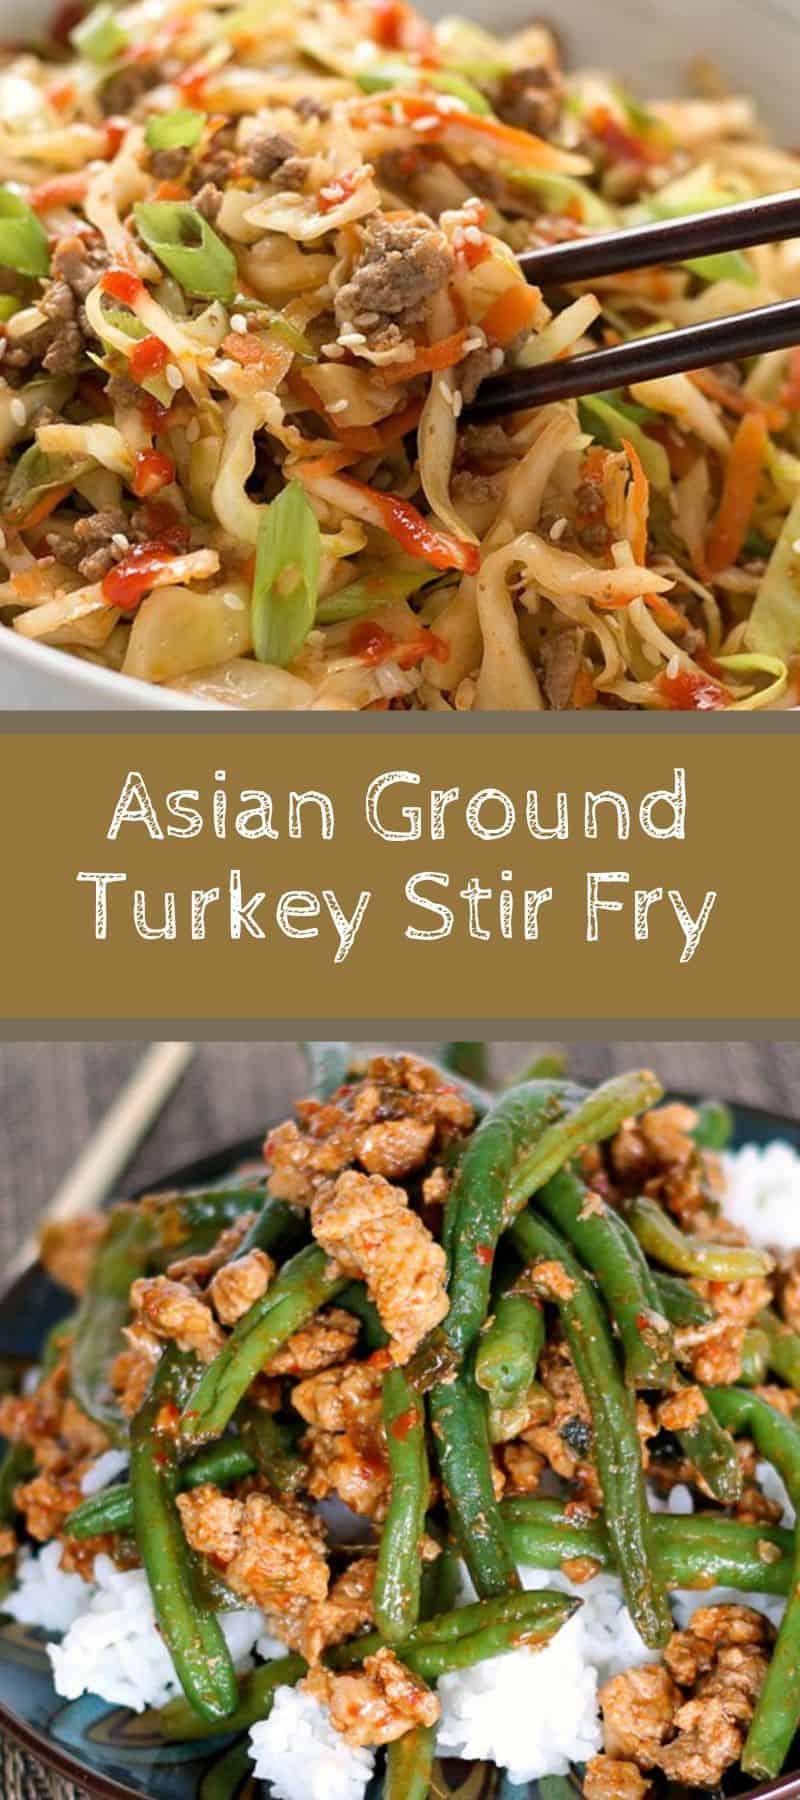 Asian Ground Turkey Stir Fry Recipe 2